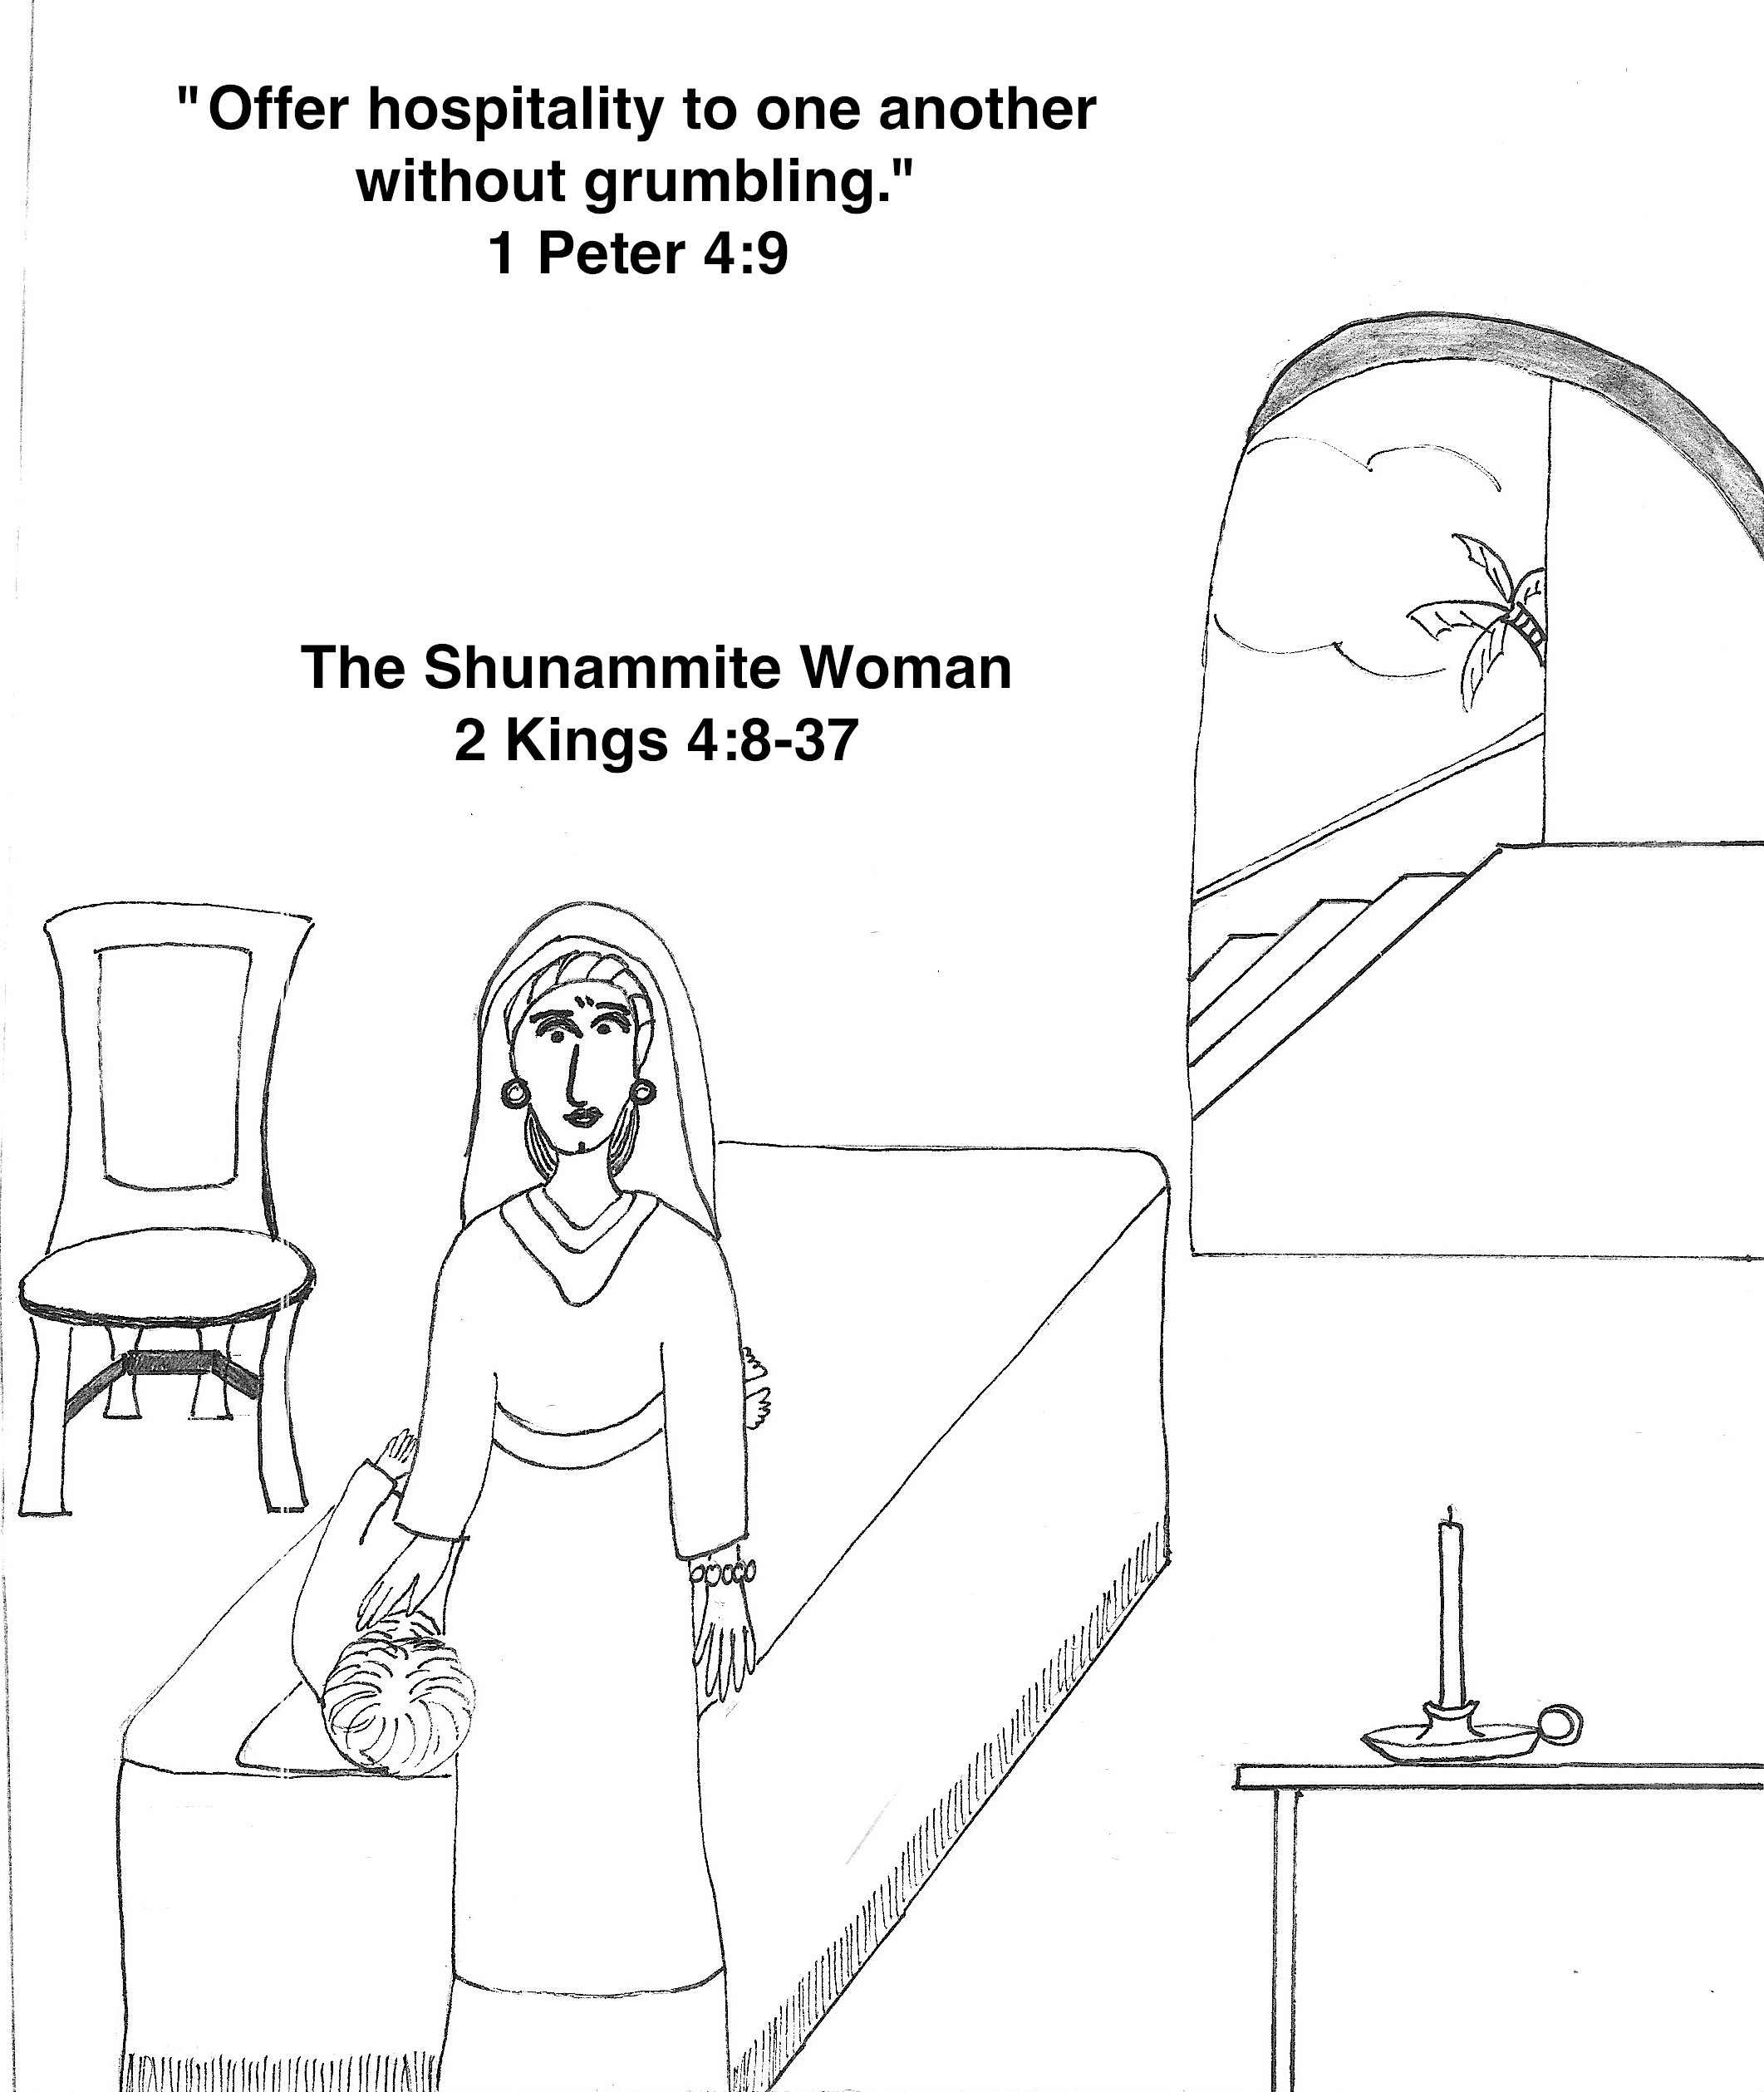 The Shunammite Woman